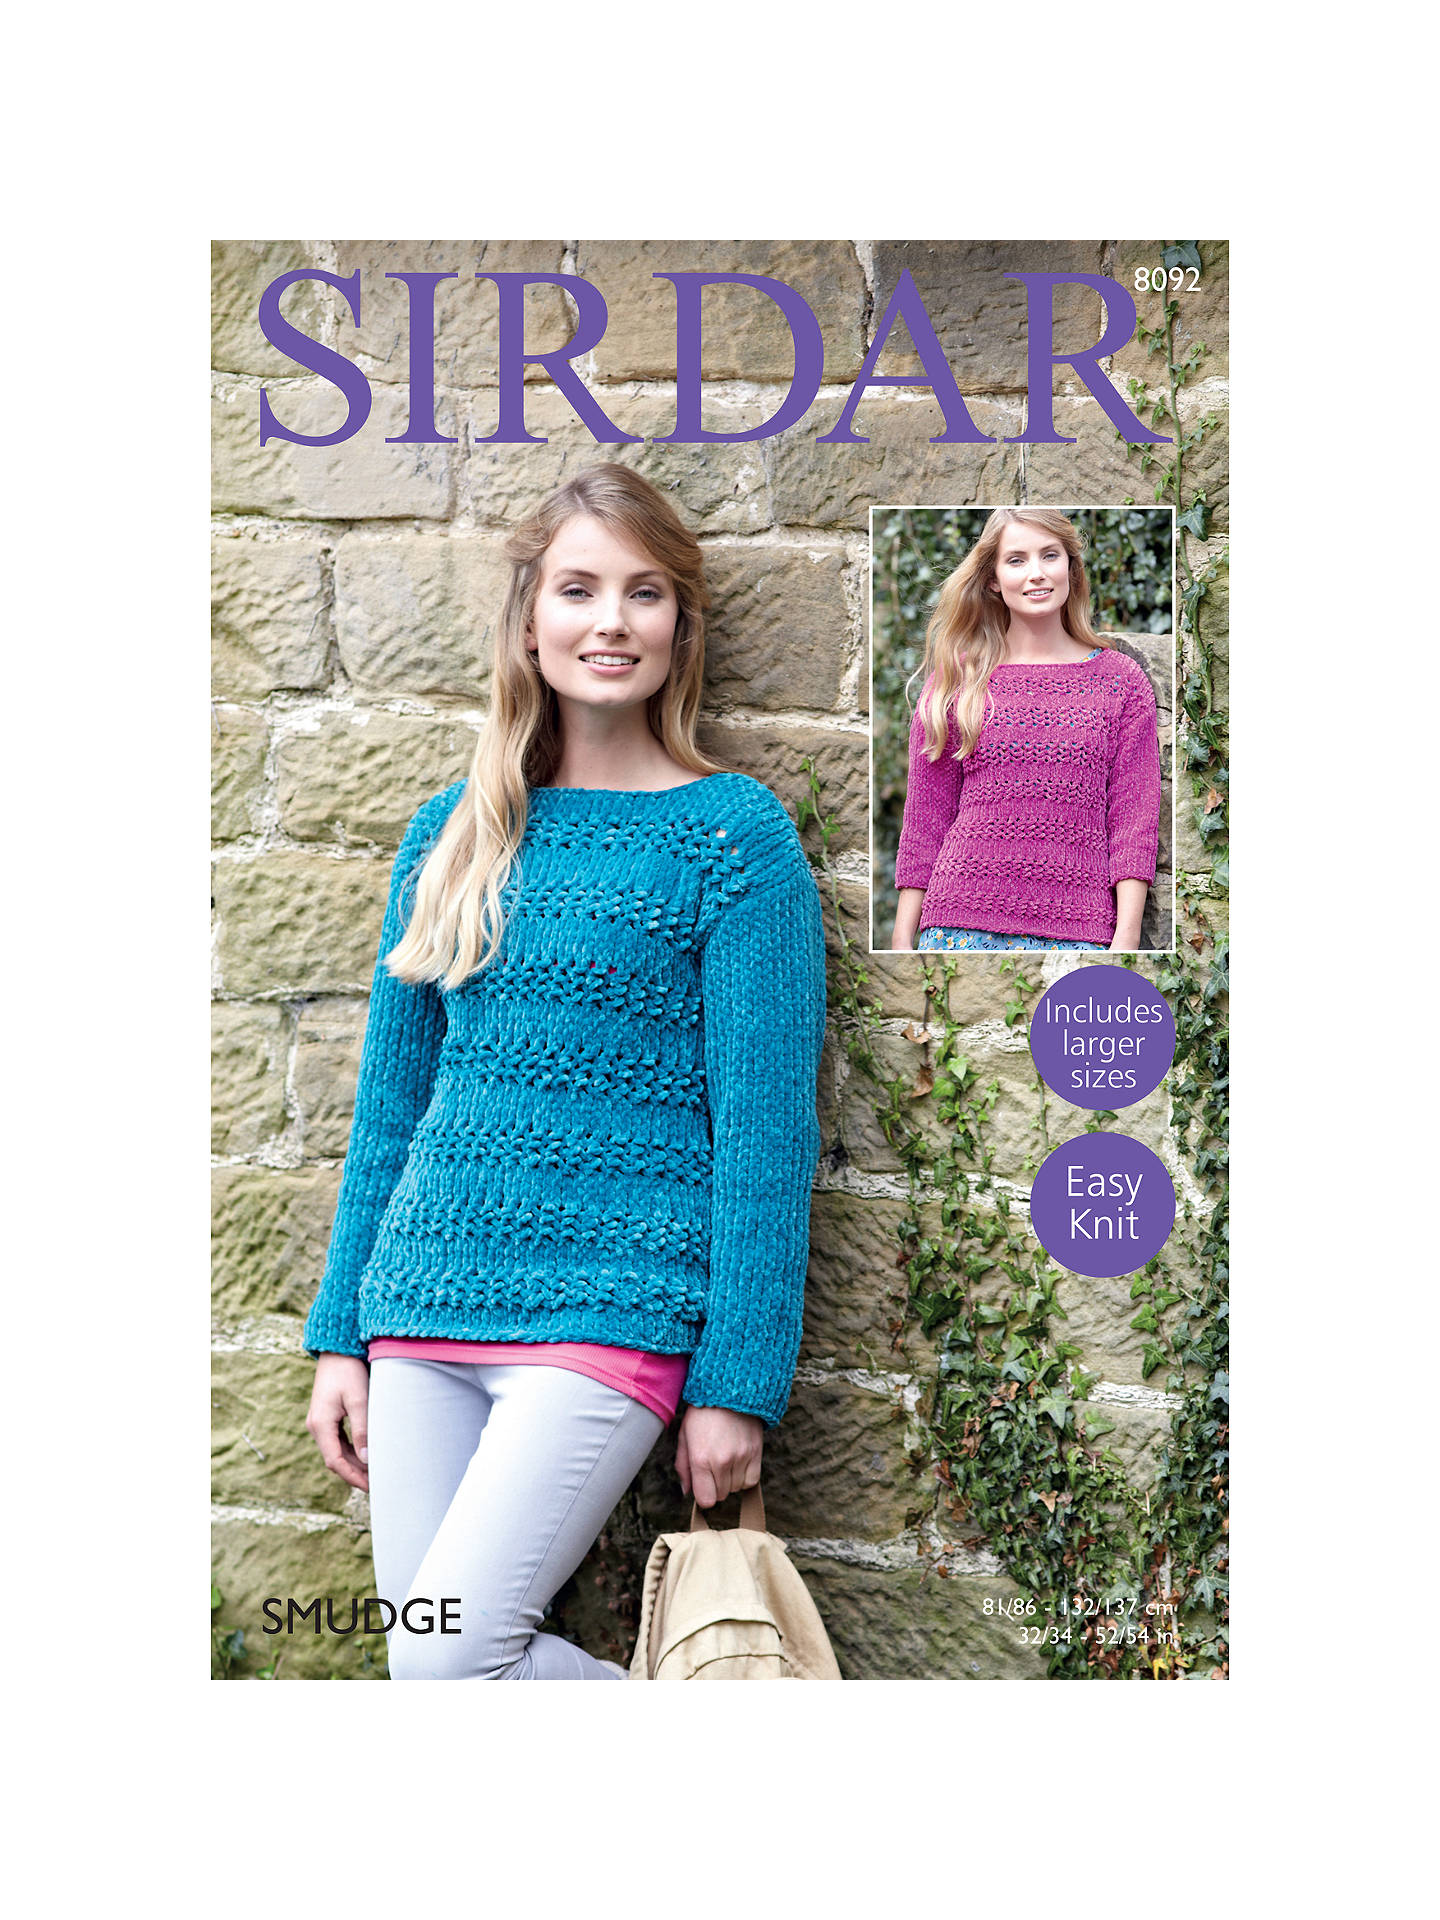 44eacc74b8e5f Buy Sirdar Smudge Women s Jumper Knitting Pattern